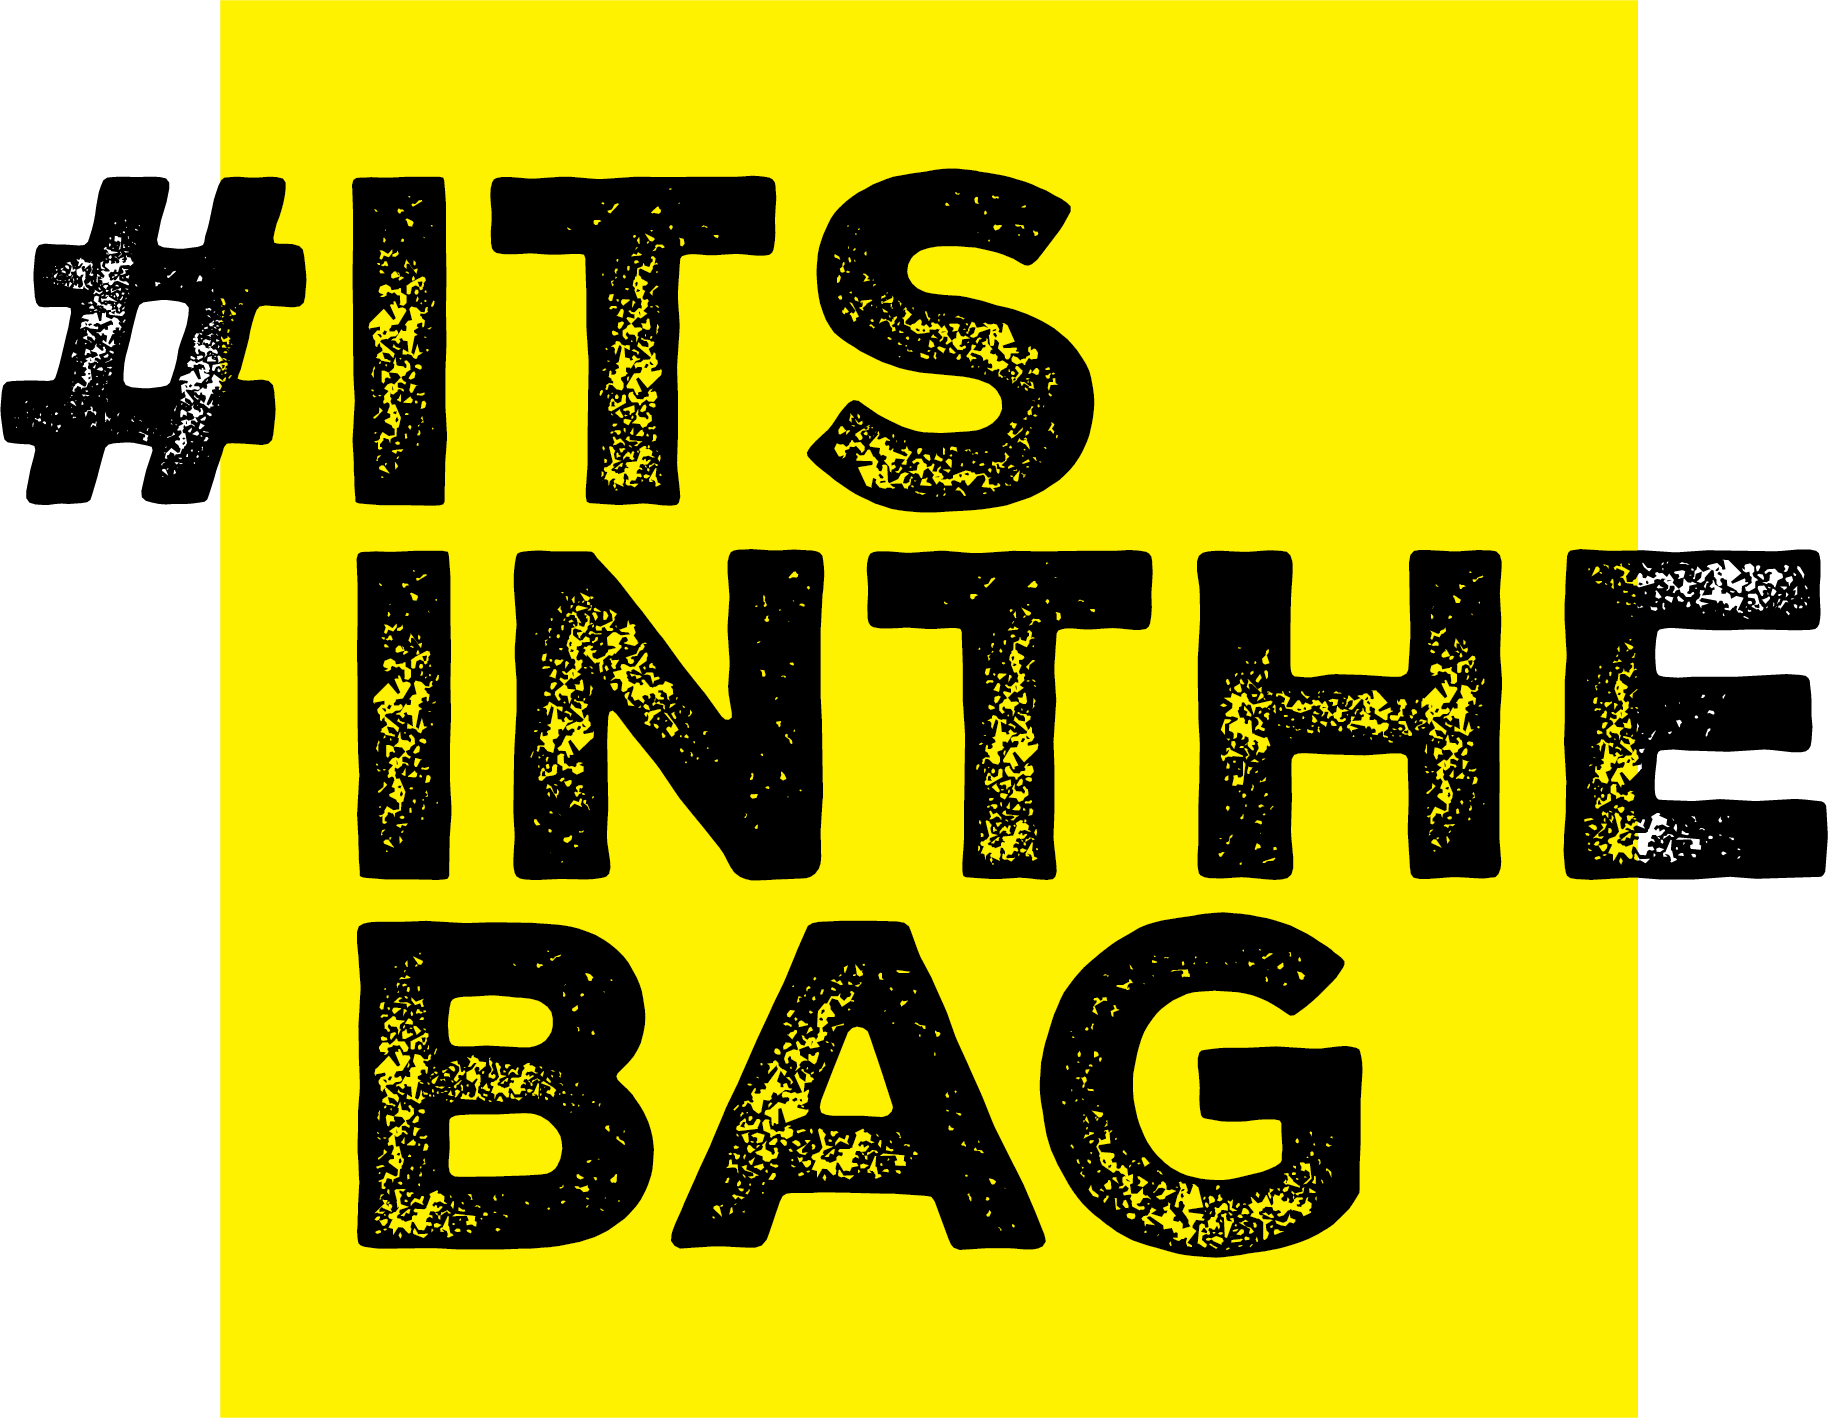 thb_IITB_logo